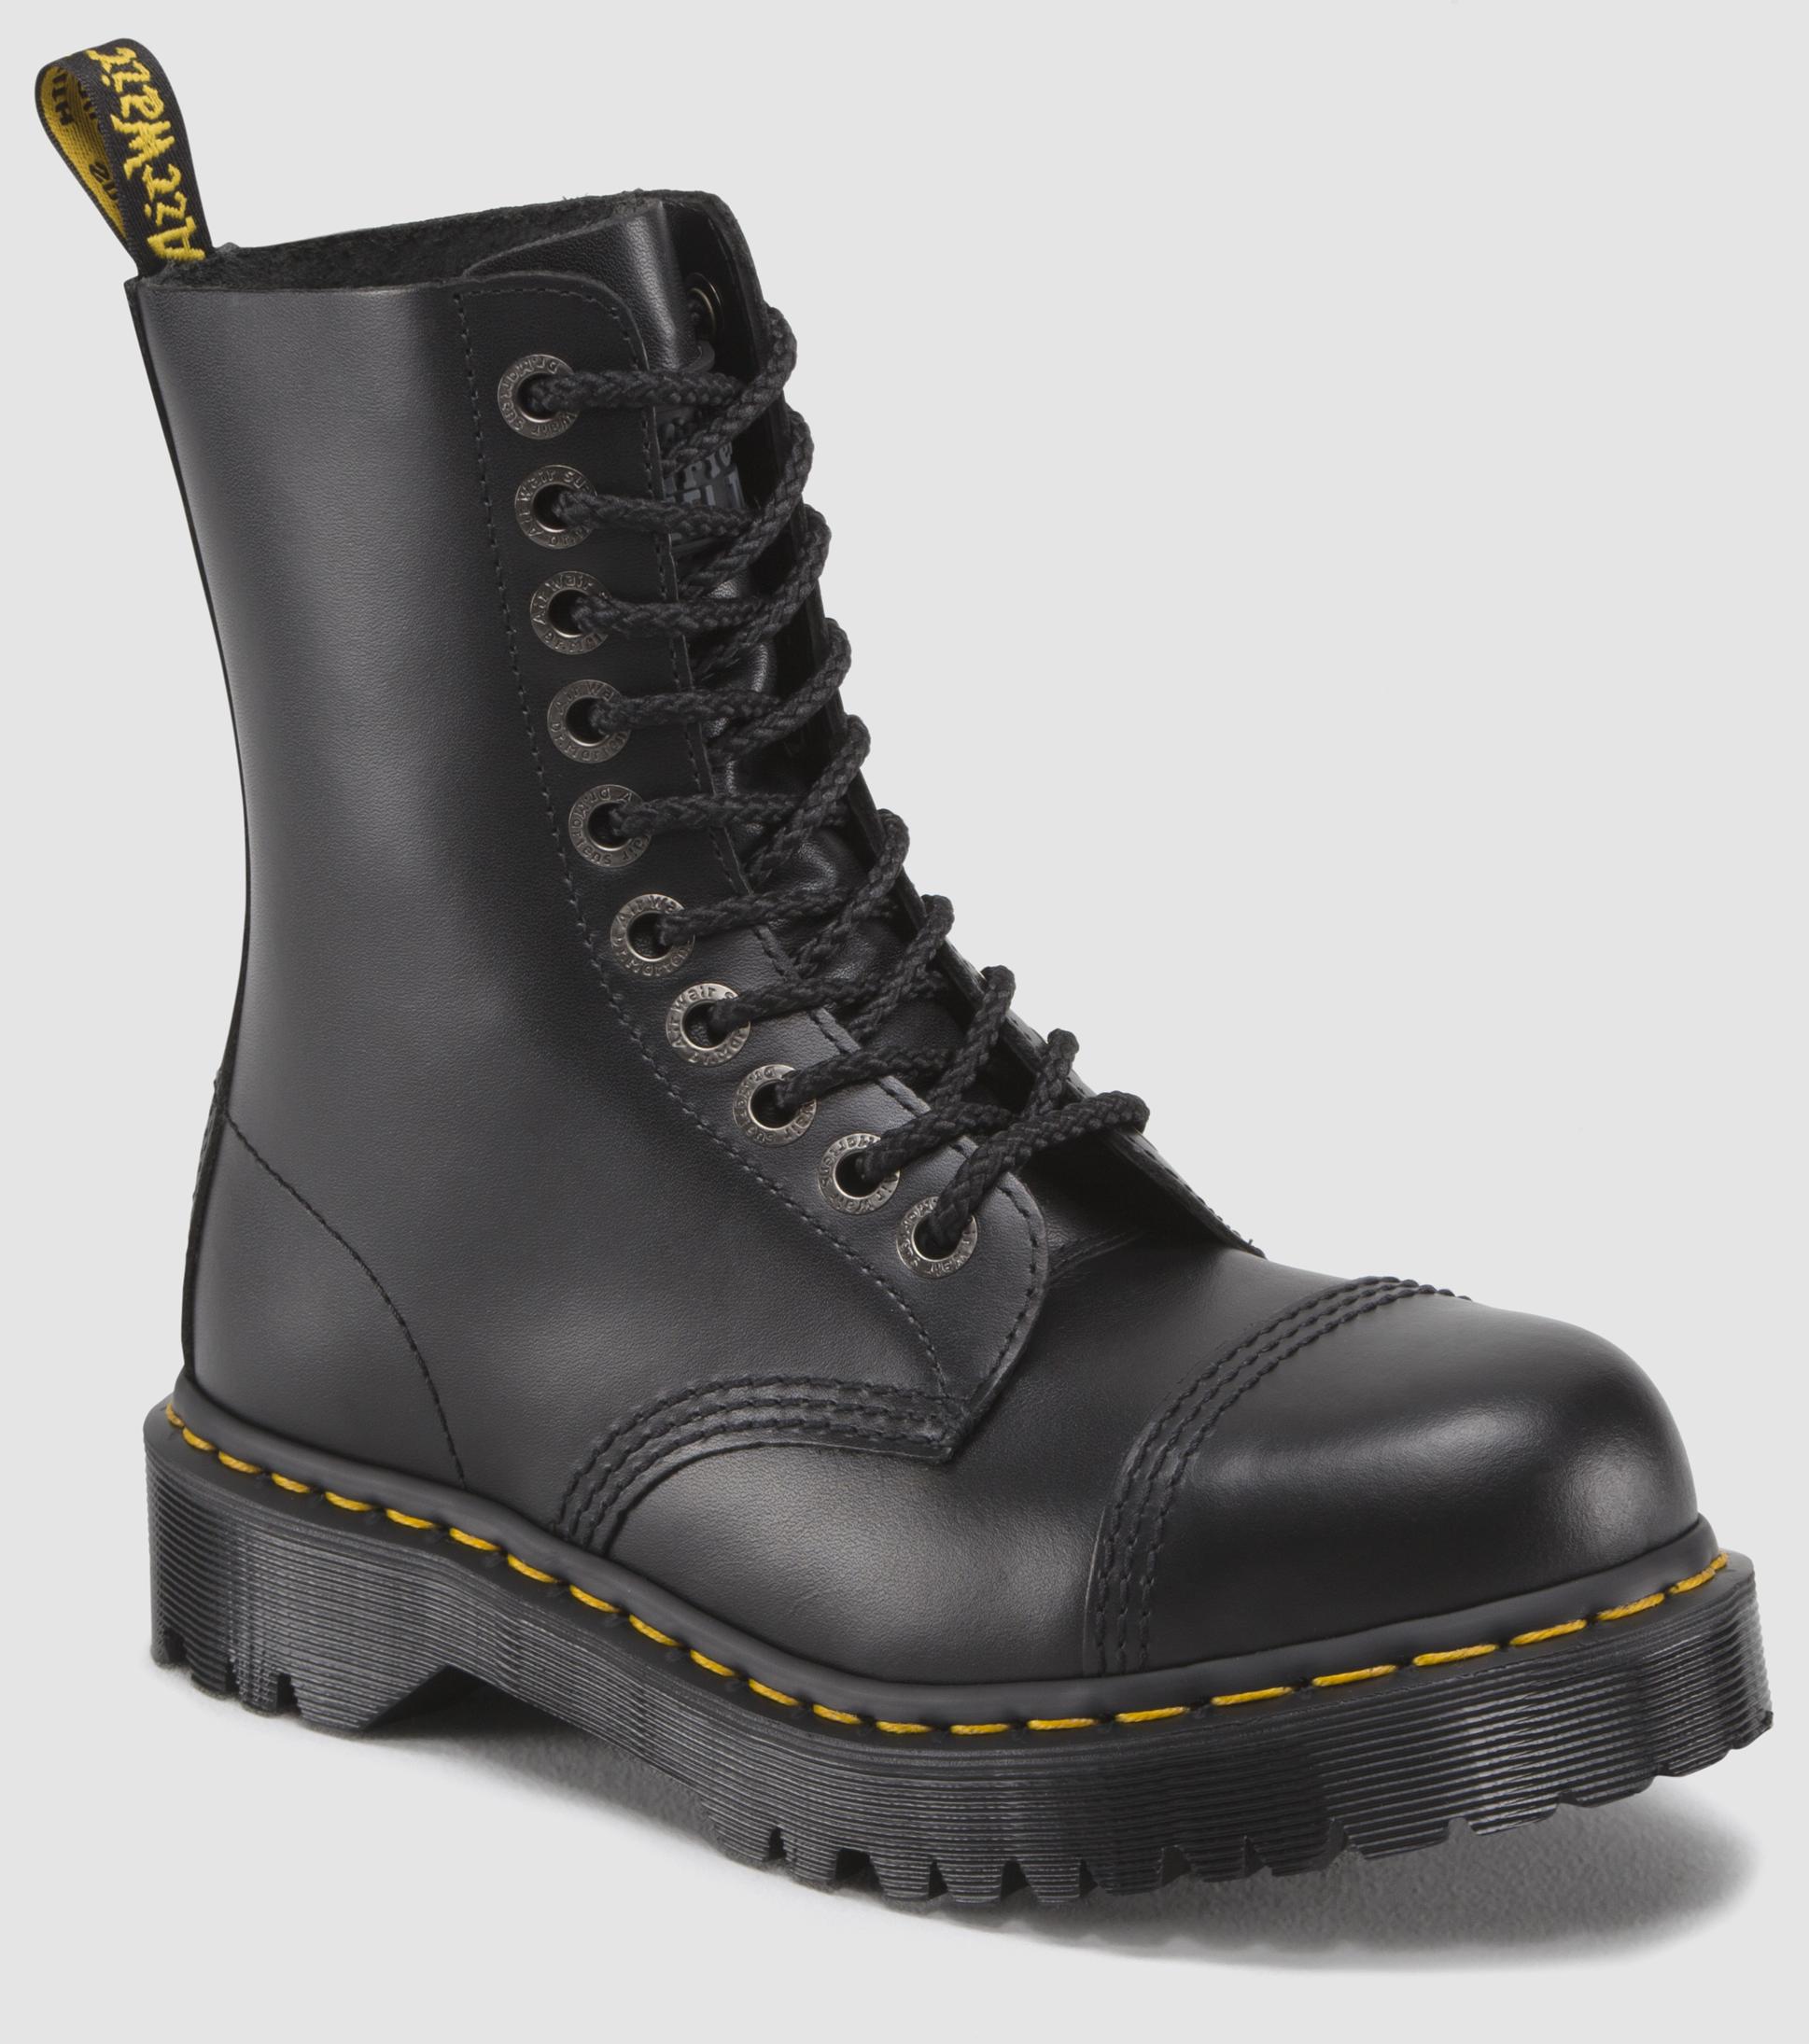 8761 Bxb Boot Men S Boots Official Dr Martens Store Us